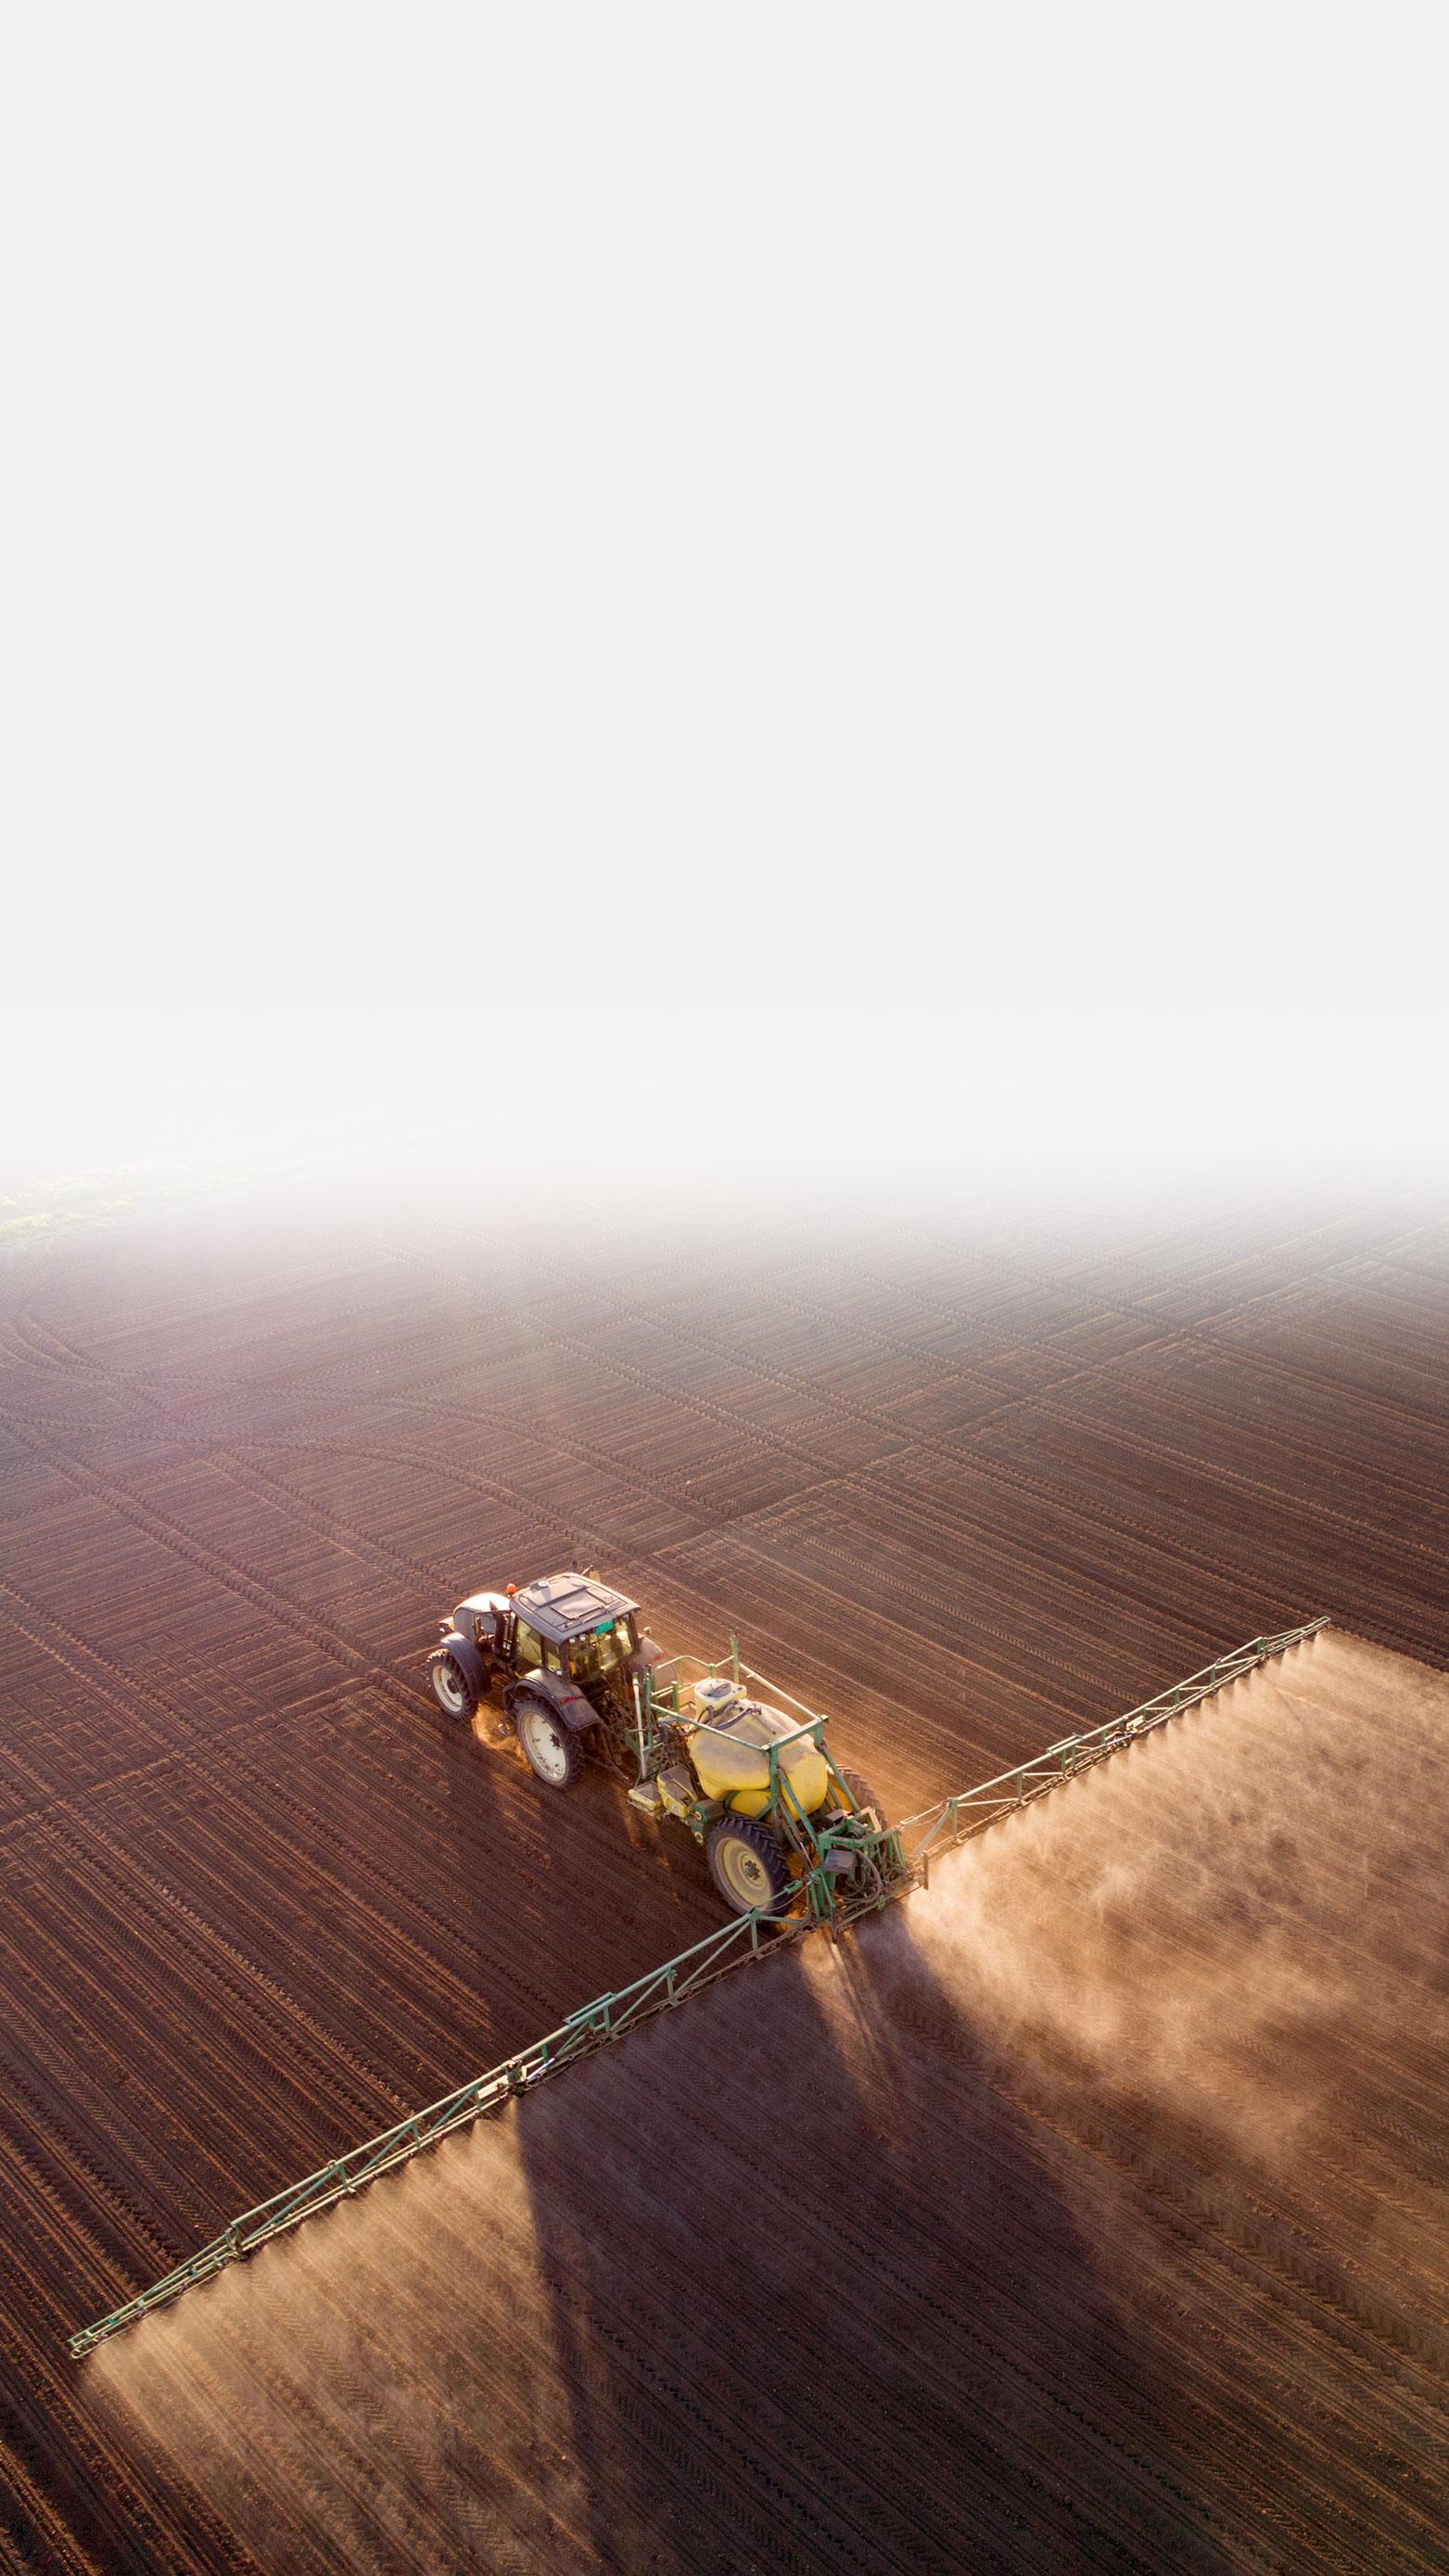 banca intesa home page easi loan farmer